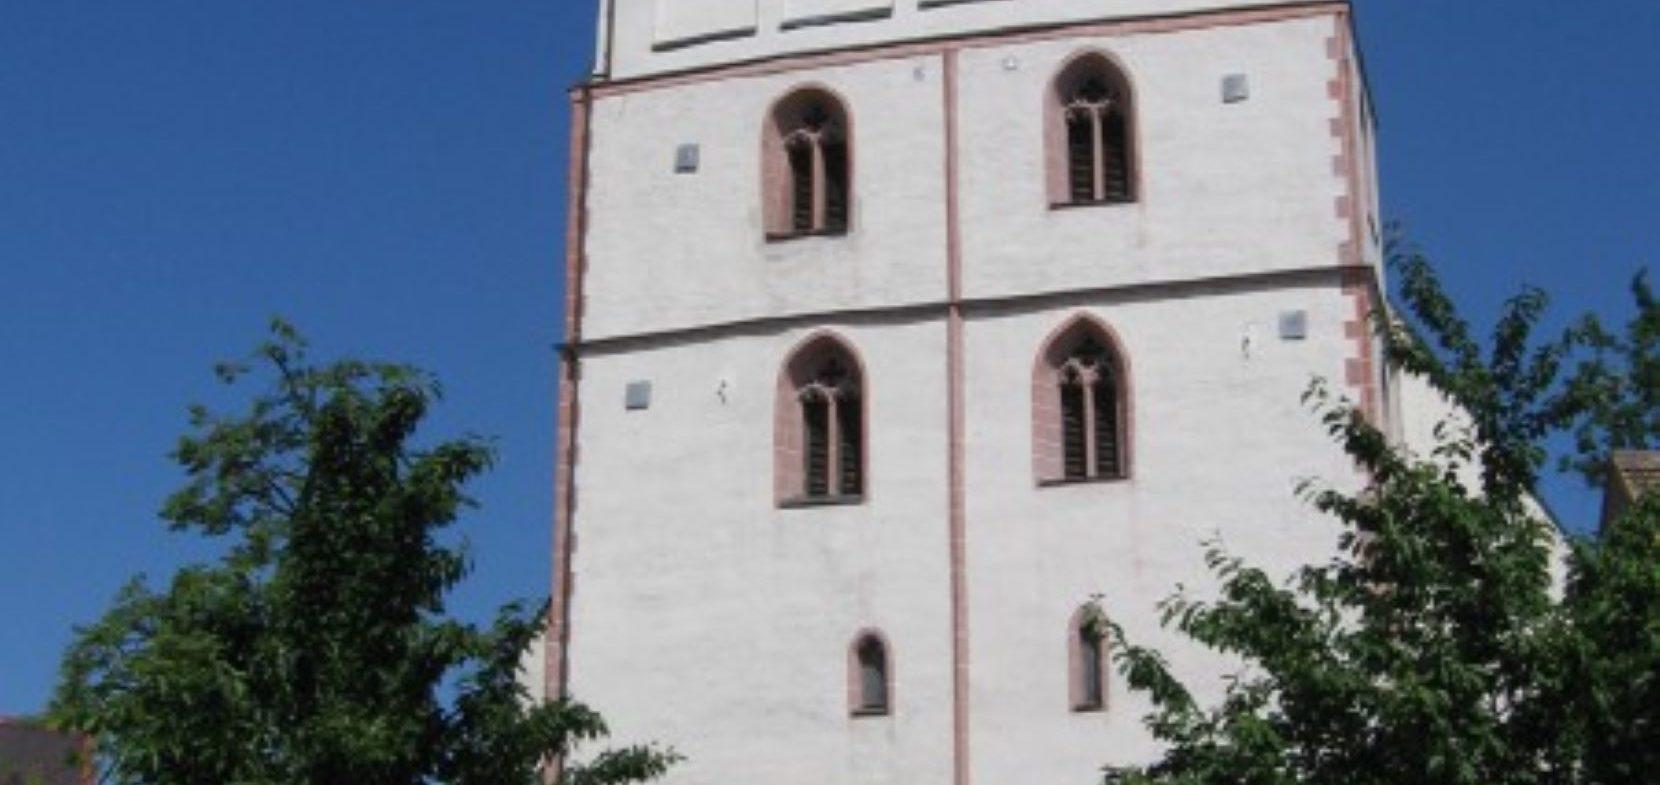 Stadtkirche St. Marien in Borna